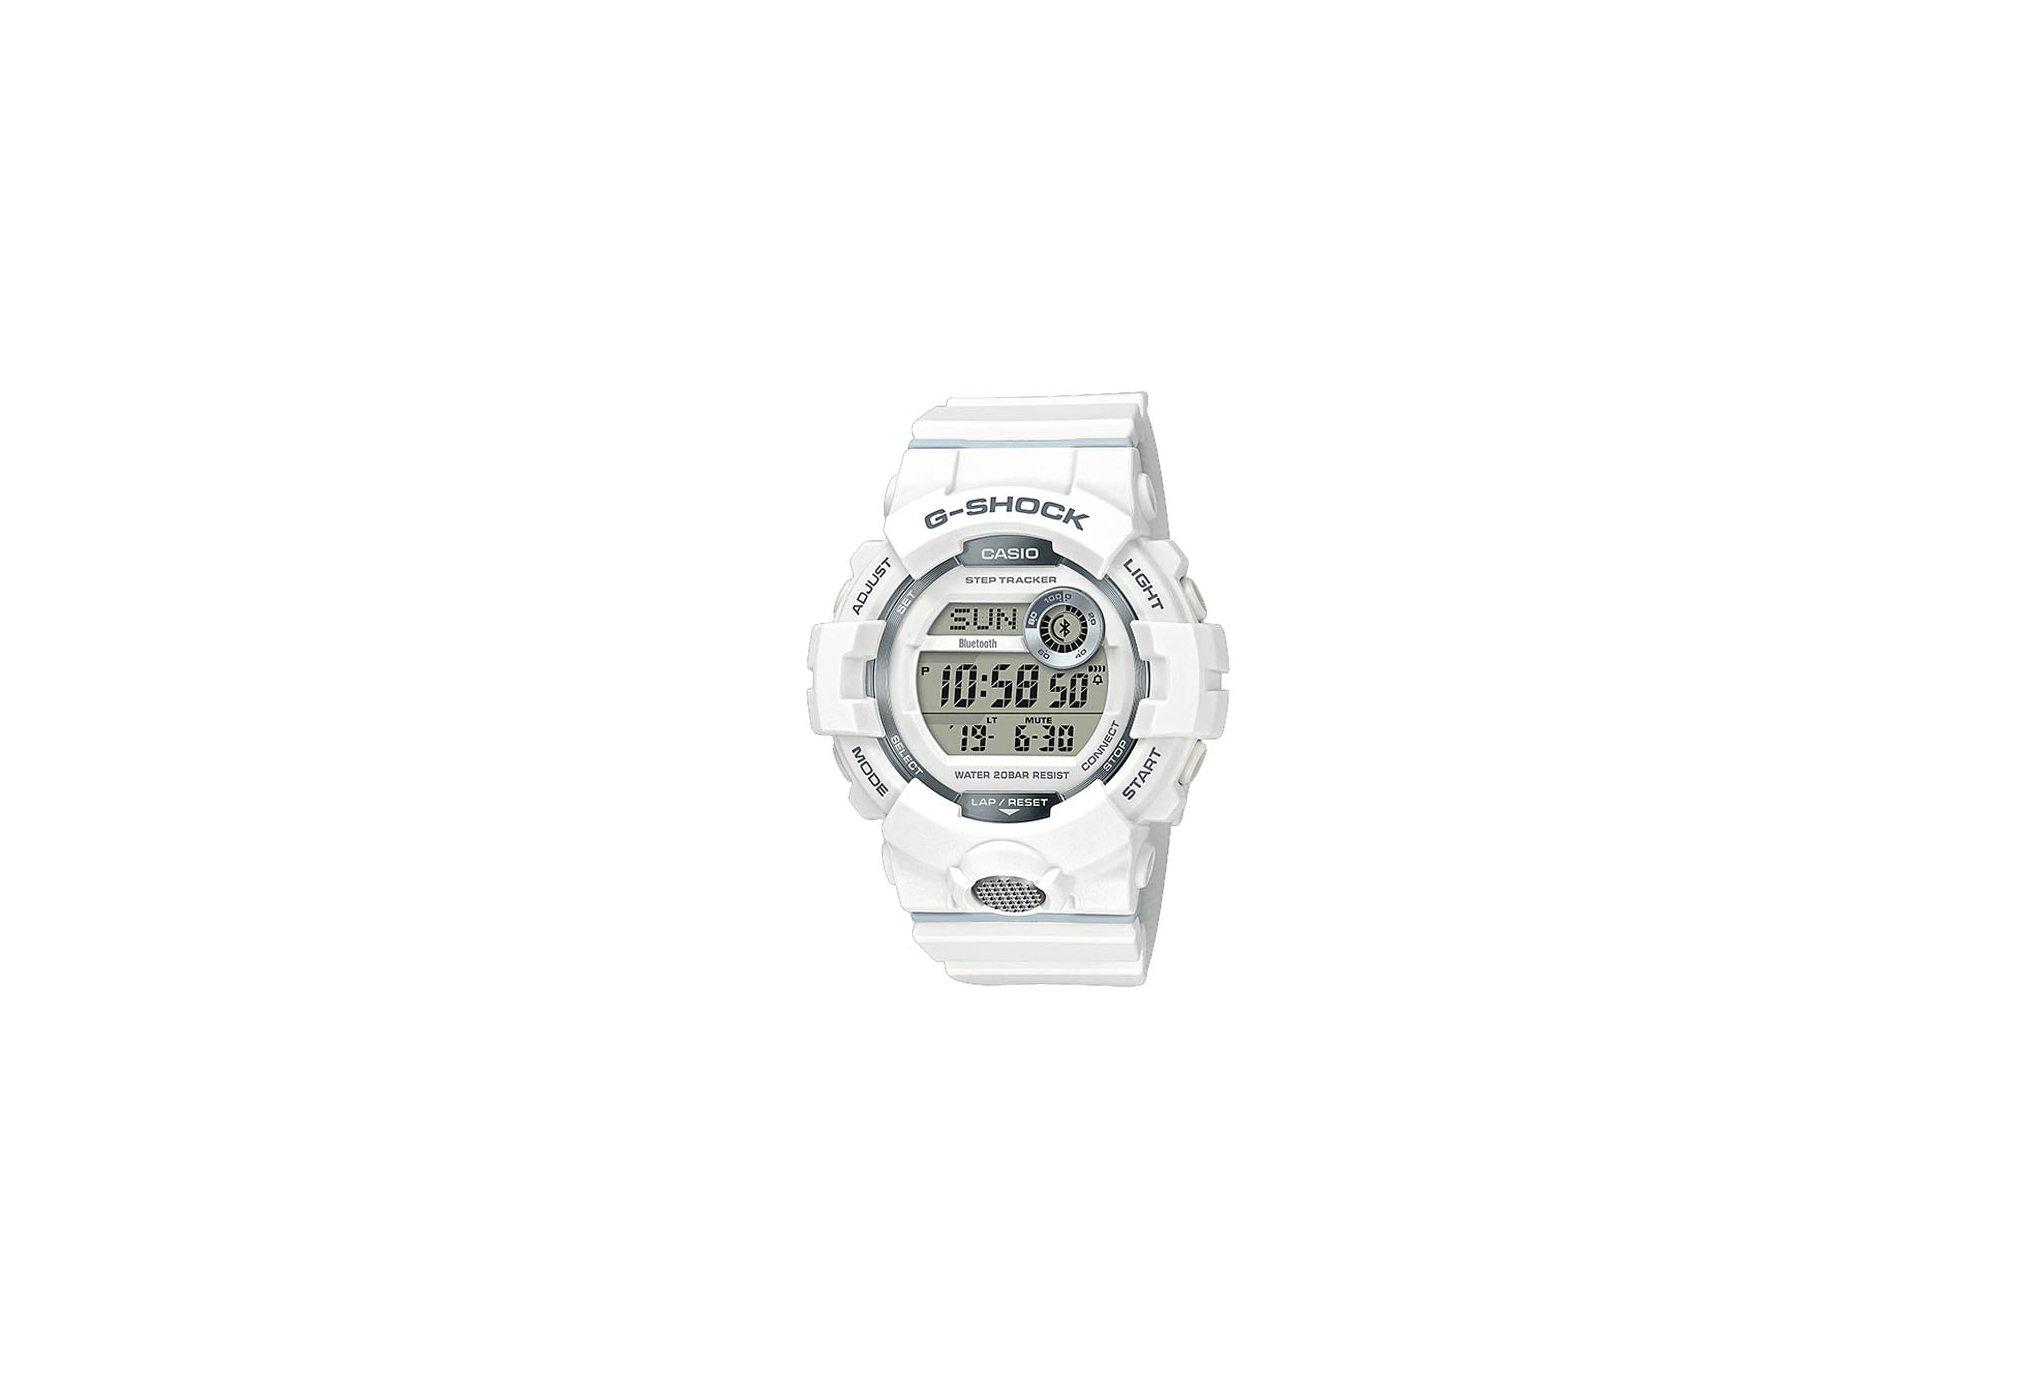 Casio G-Shock gbd-800 montres de sport